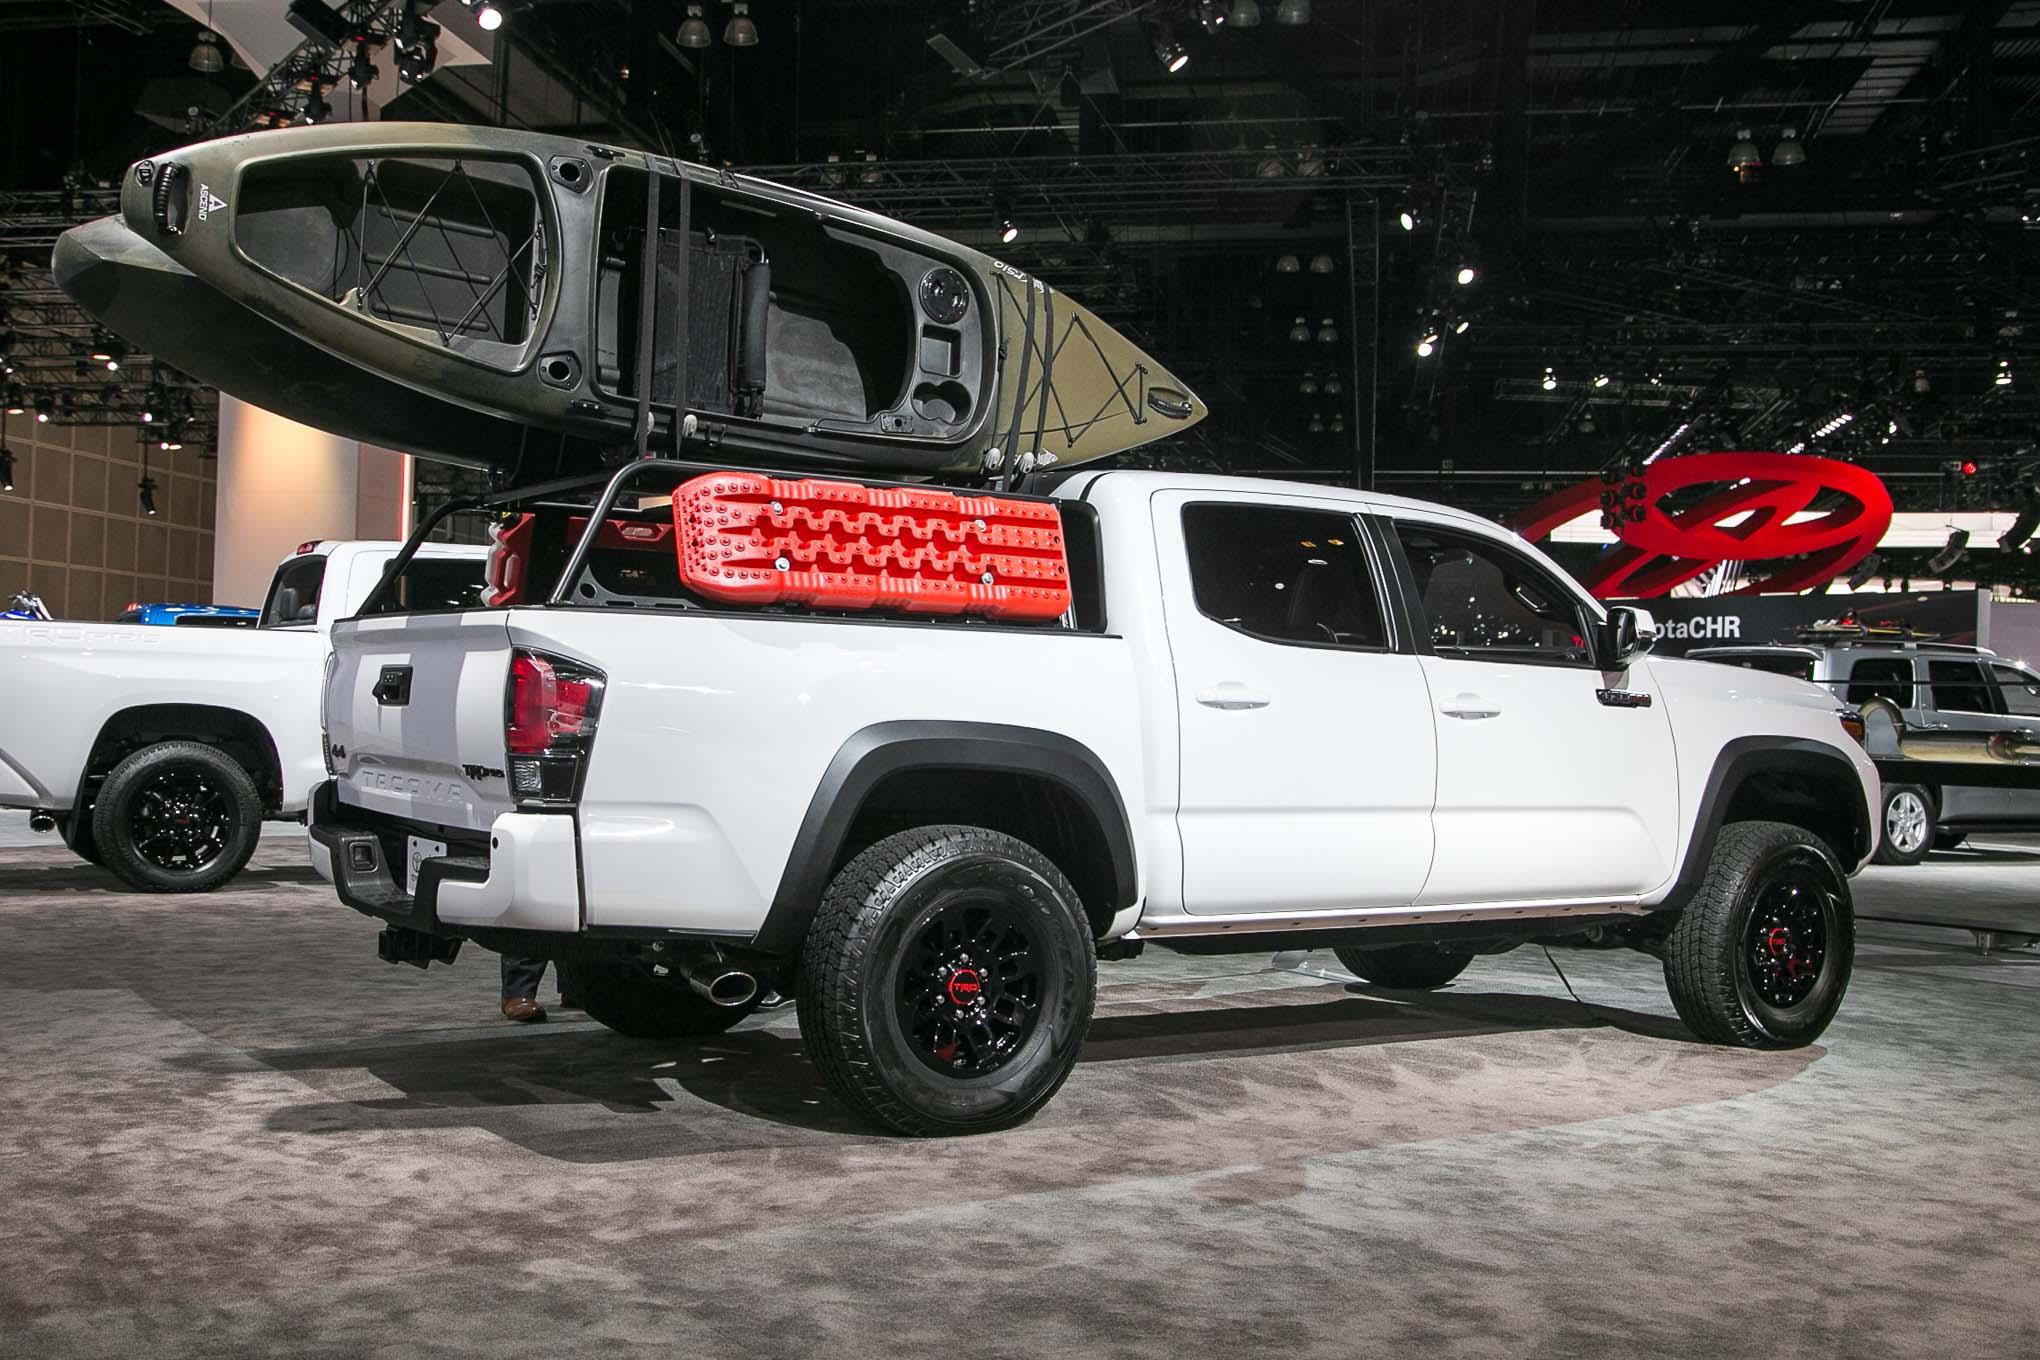 2017 Toyota Tacoma TRD Pro rear three quarter